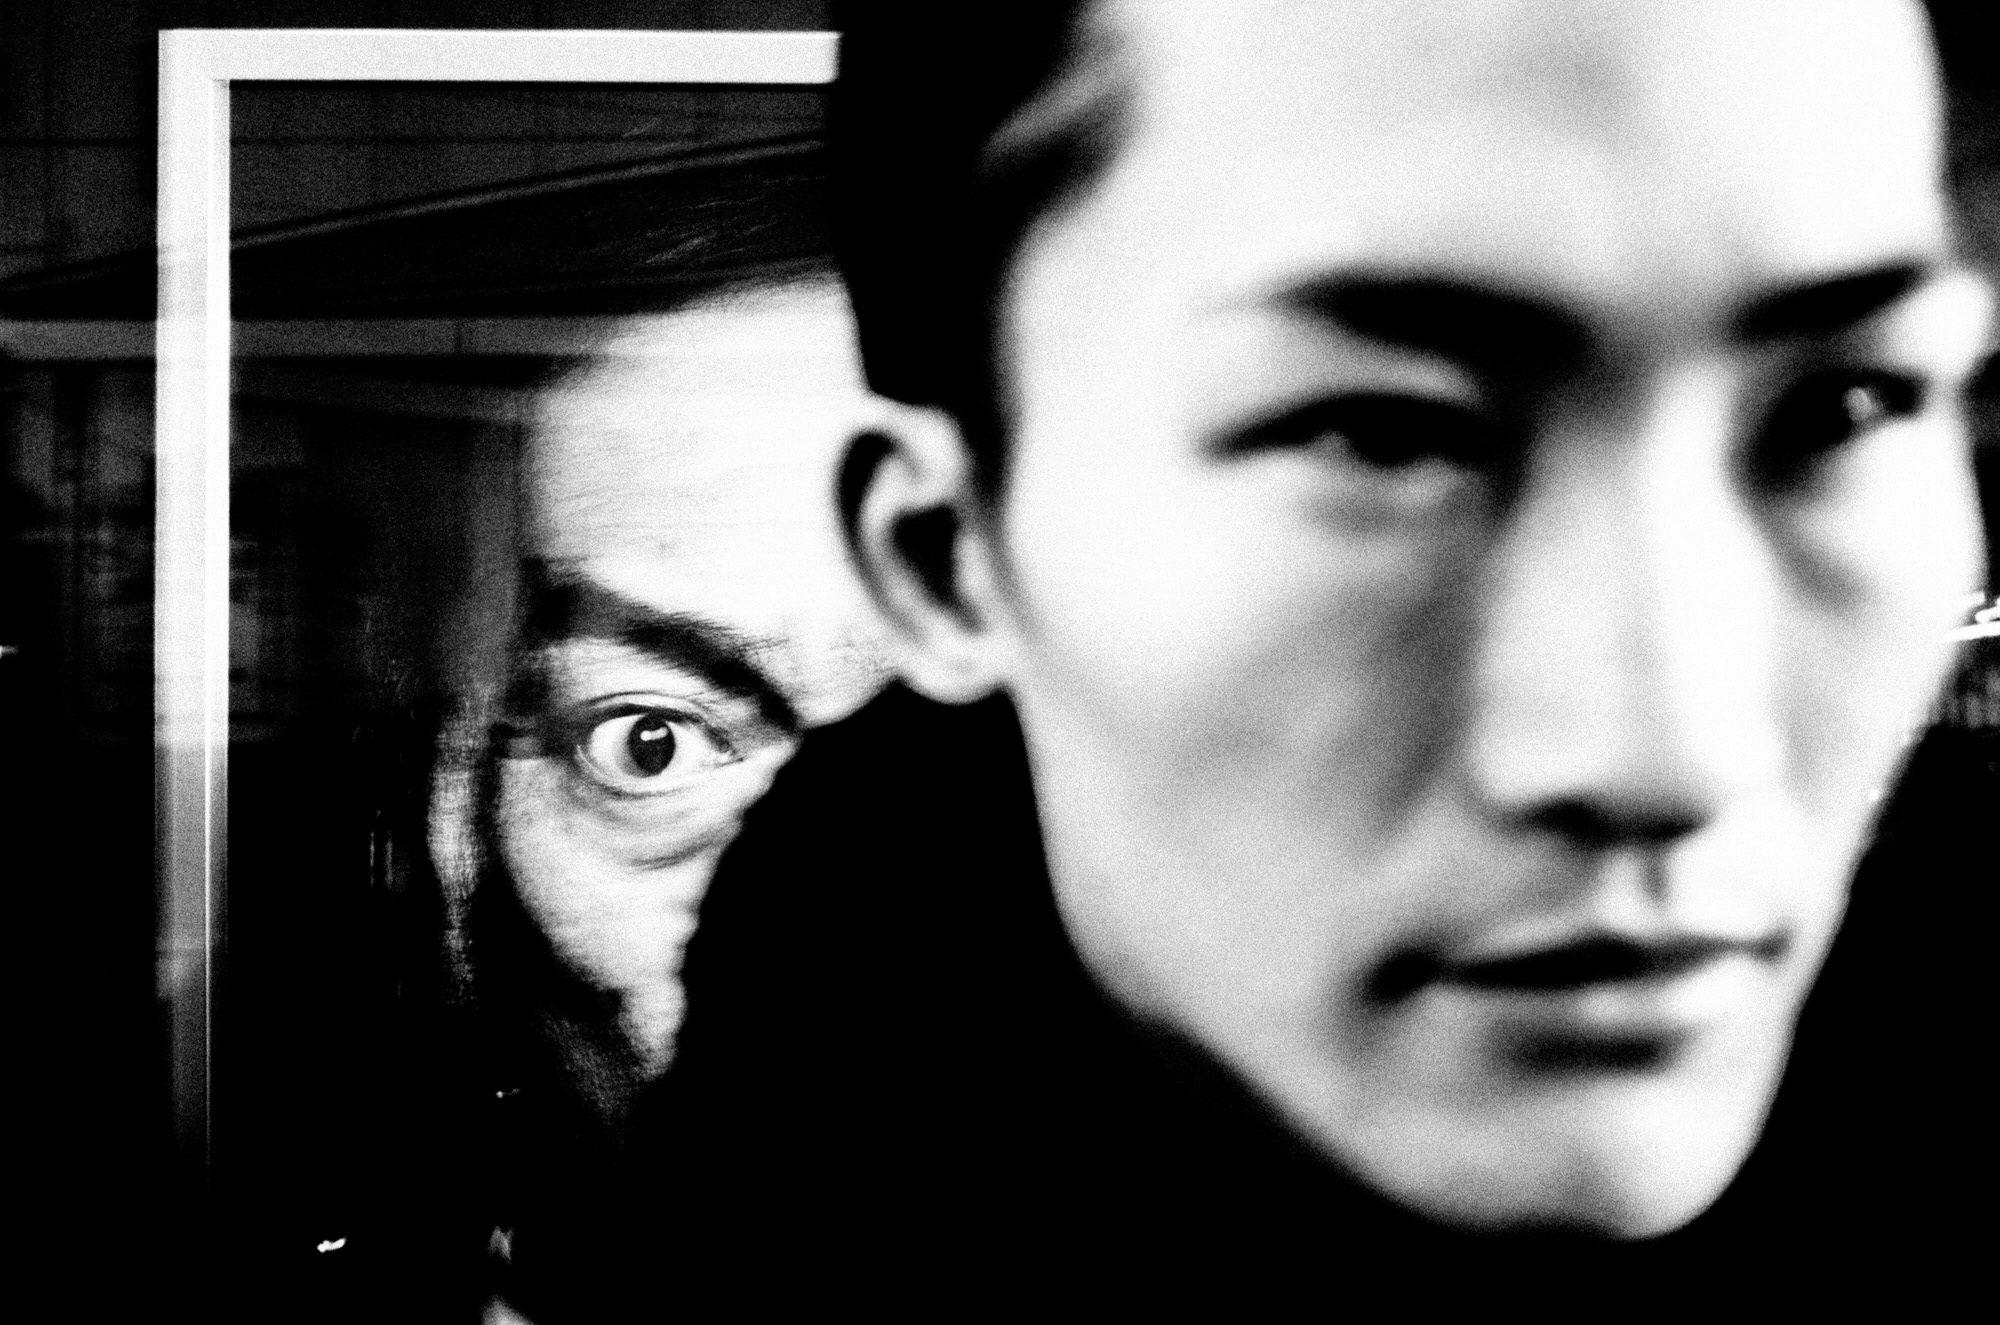 tokyo-eye-eric-kim-street-photography-contact-sheet-0000550